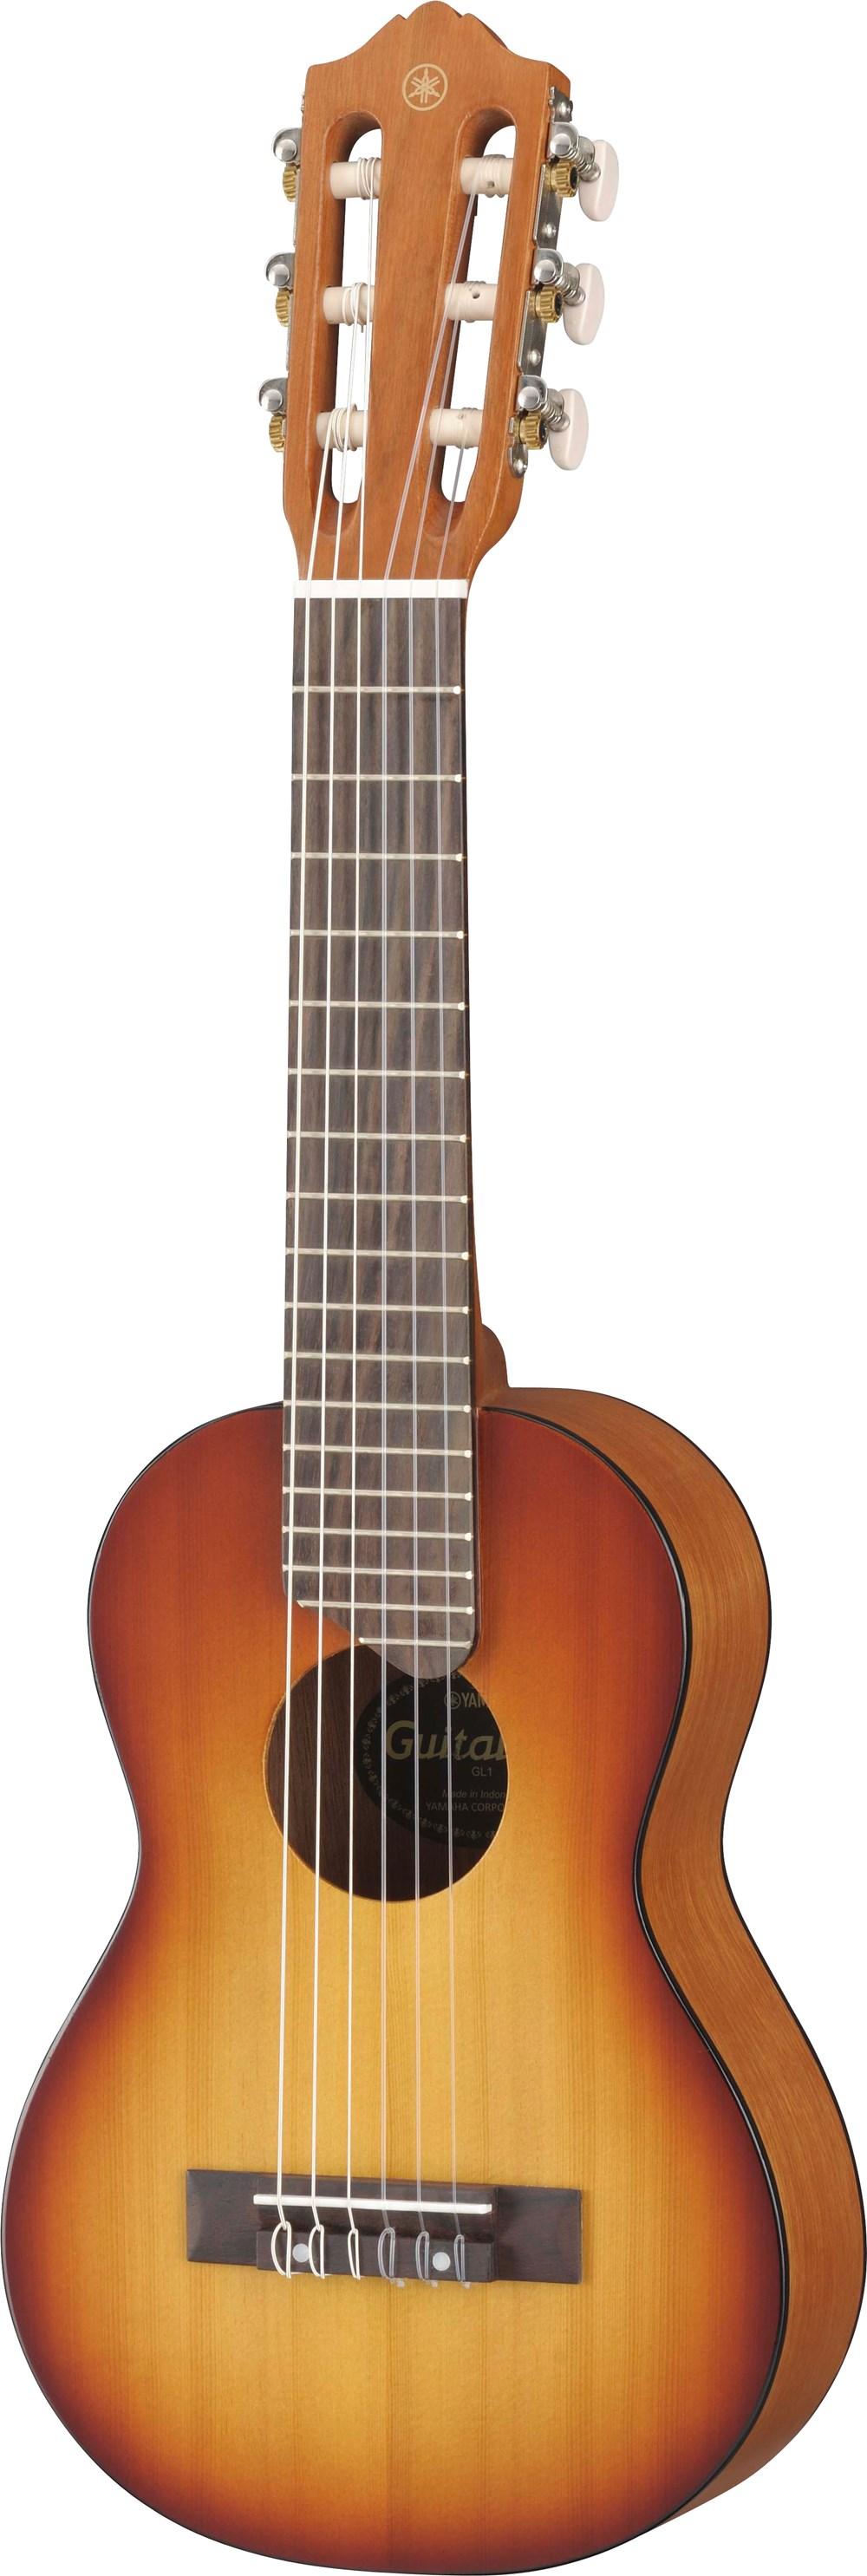 Đàn Guitar Classic Yamaha GL1, guitar trẻ em